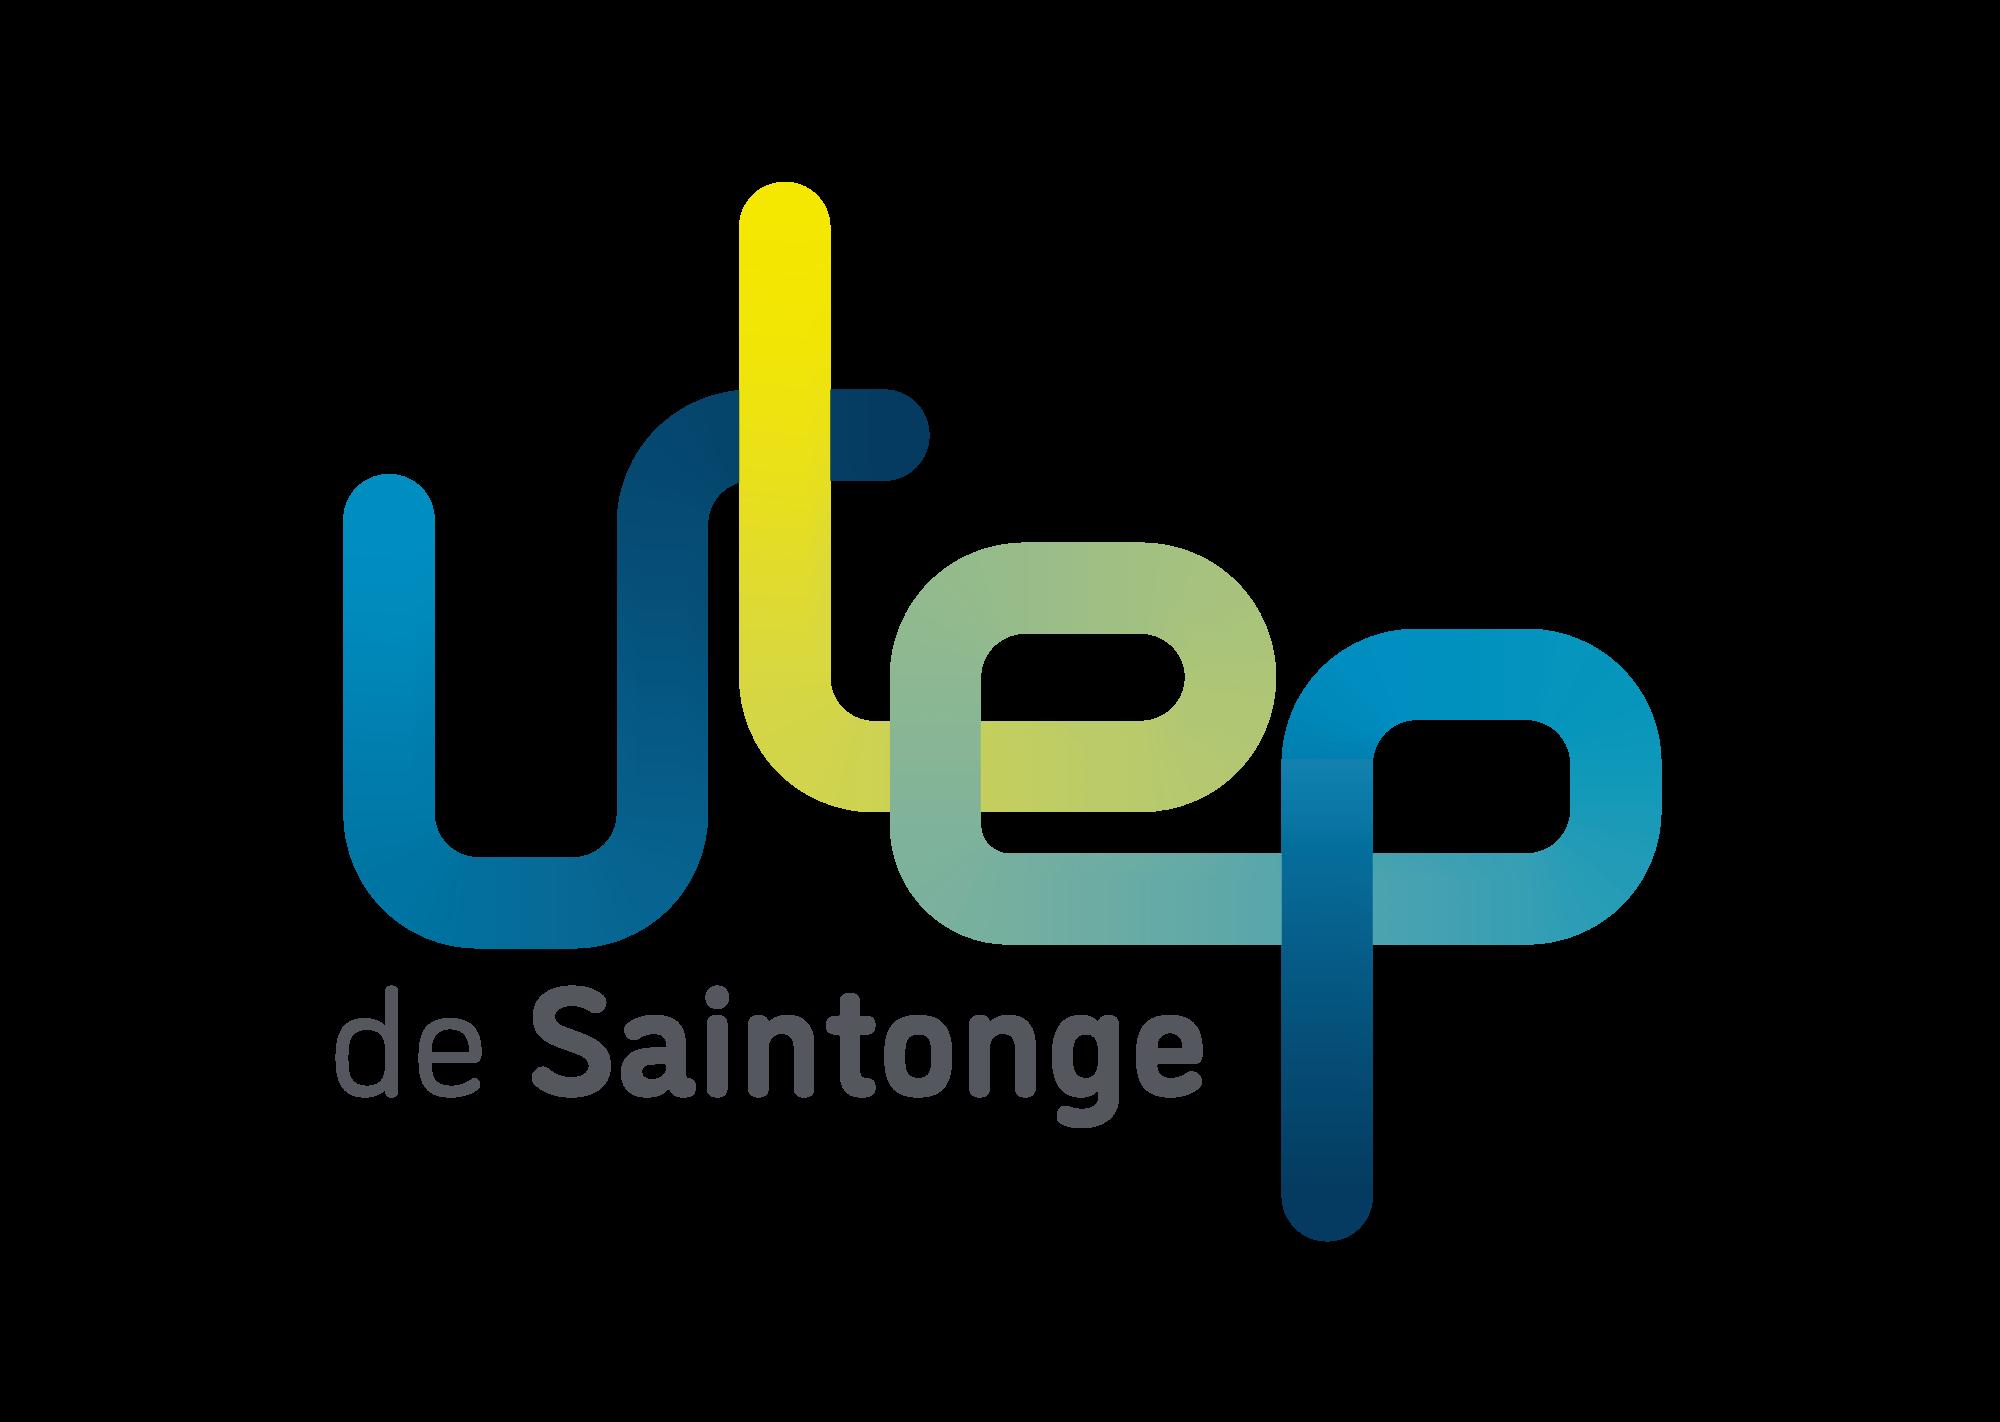 UTEP Saintonge